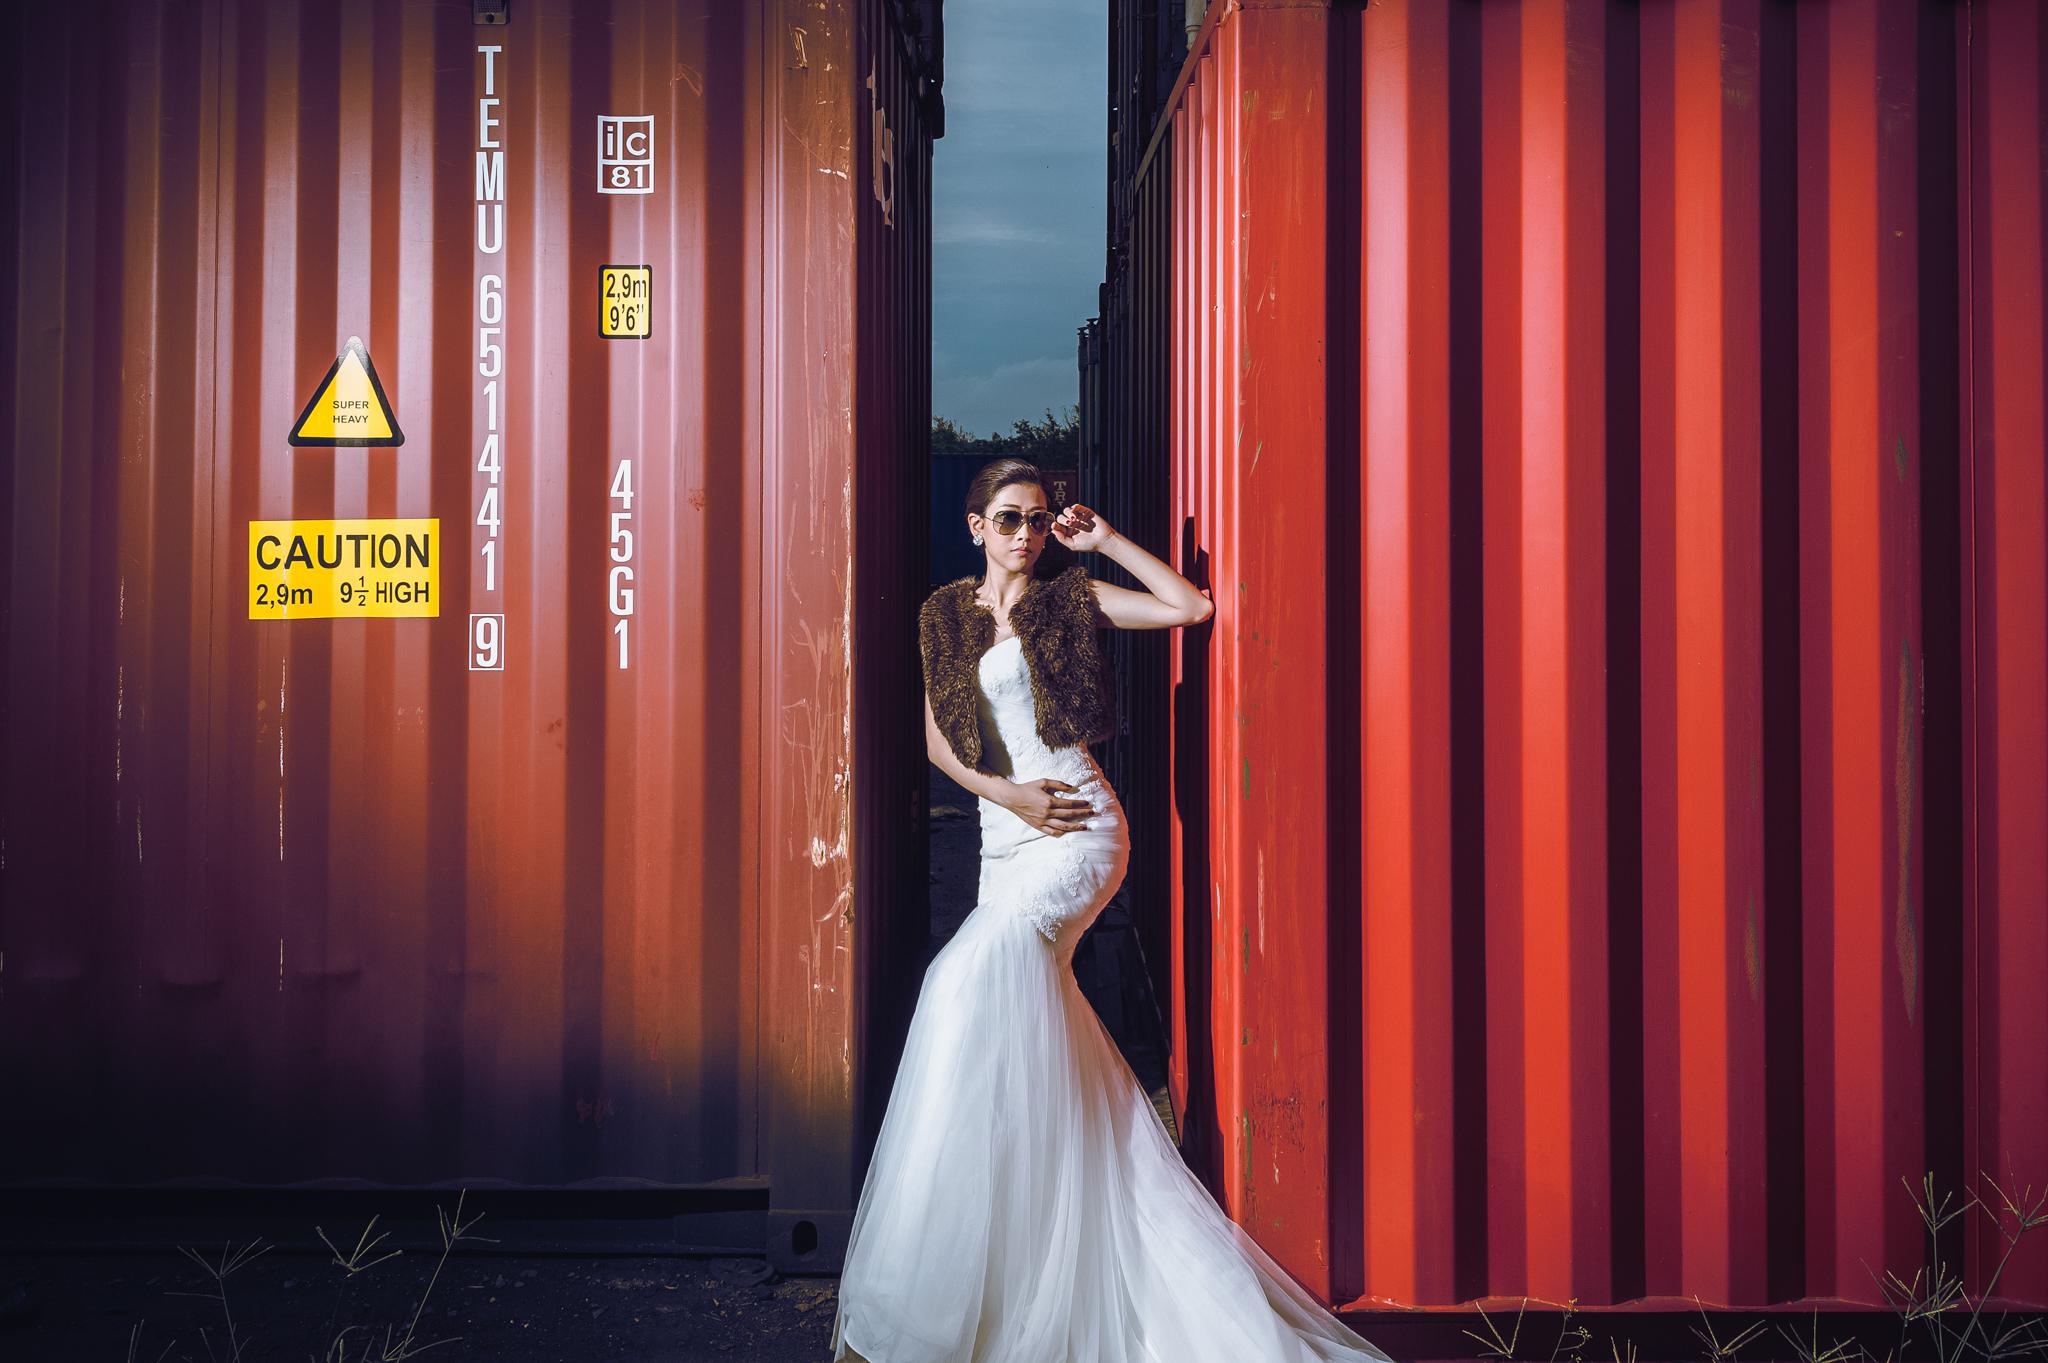 Eric Yeh 孕婦寫真 寶寶寫真 獨立攝影師 Eric 獨立婚紗 自助婚紗 婚禮紀實 平面攝影 婚禮紀錄 海外婚紗 自主婚紗 婚禮攝影 婚禮記錄